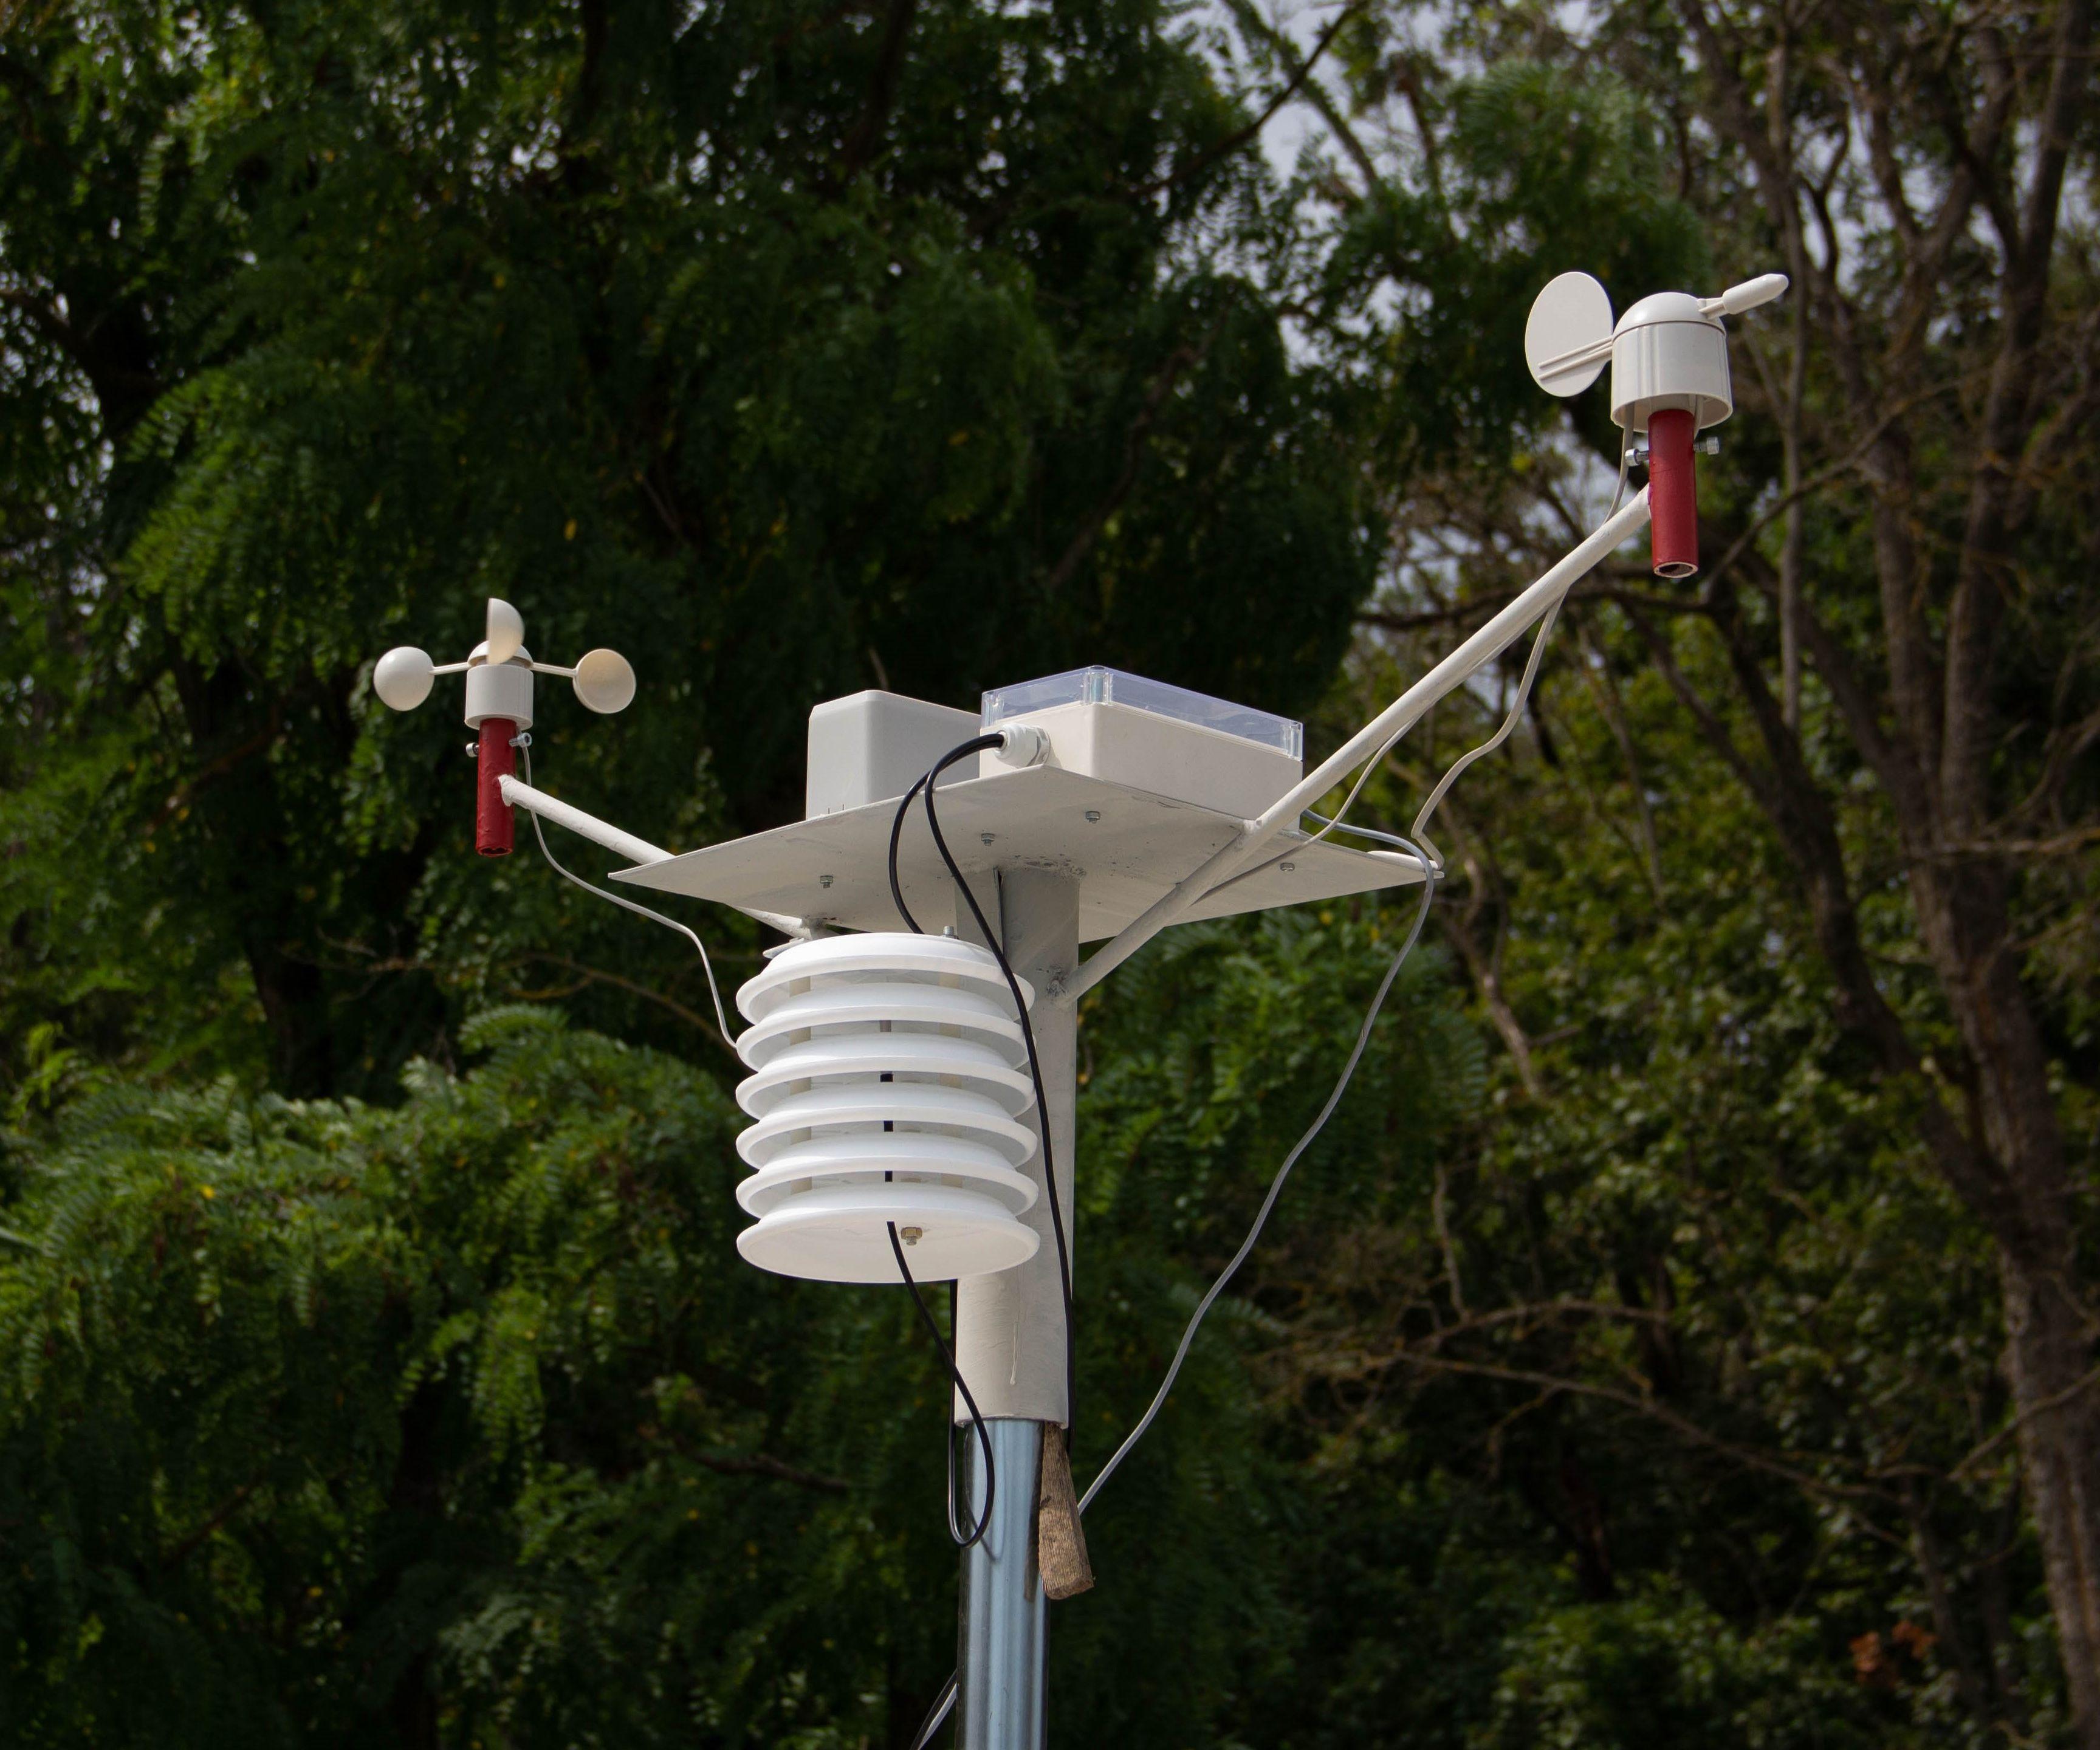 ESP32 Weathercloud Weather Station